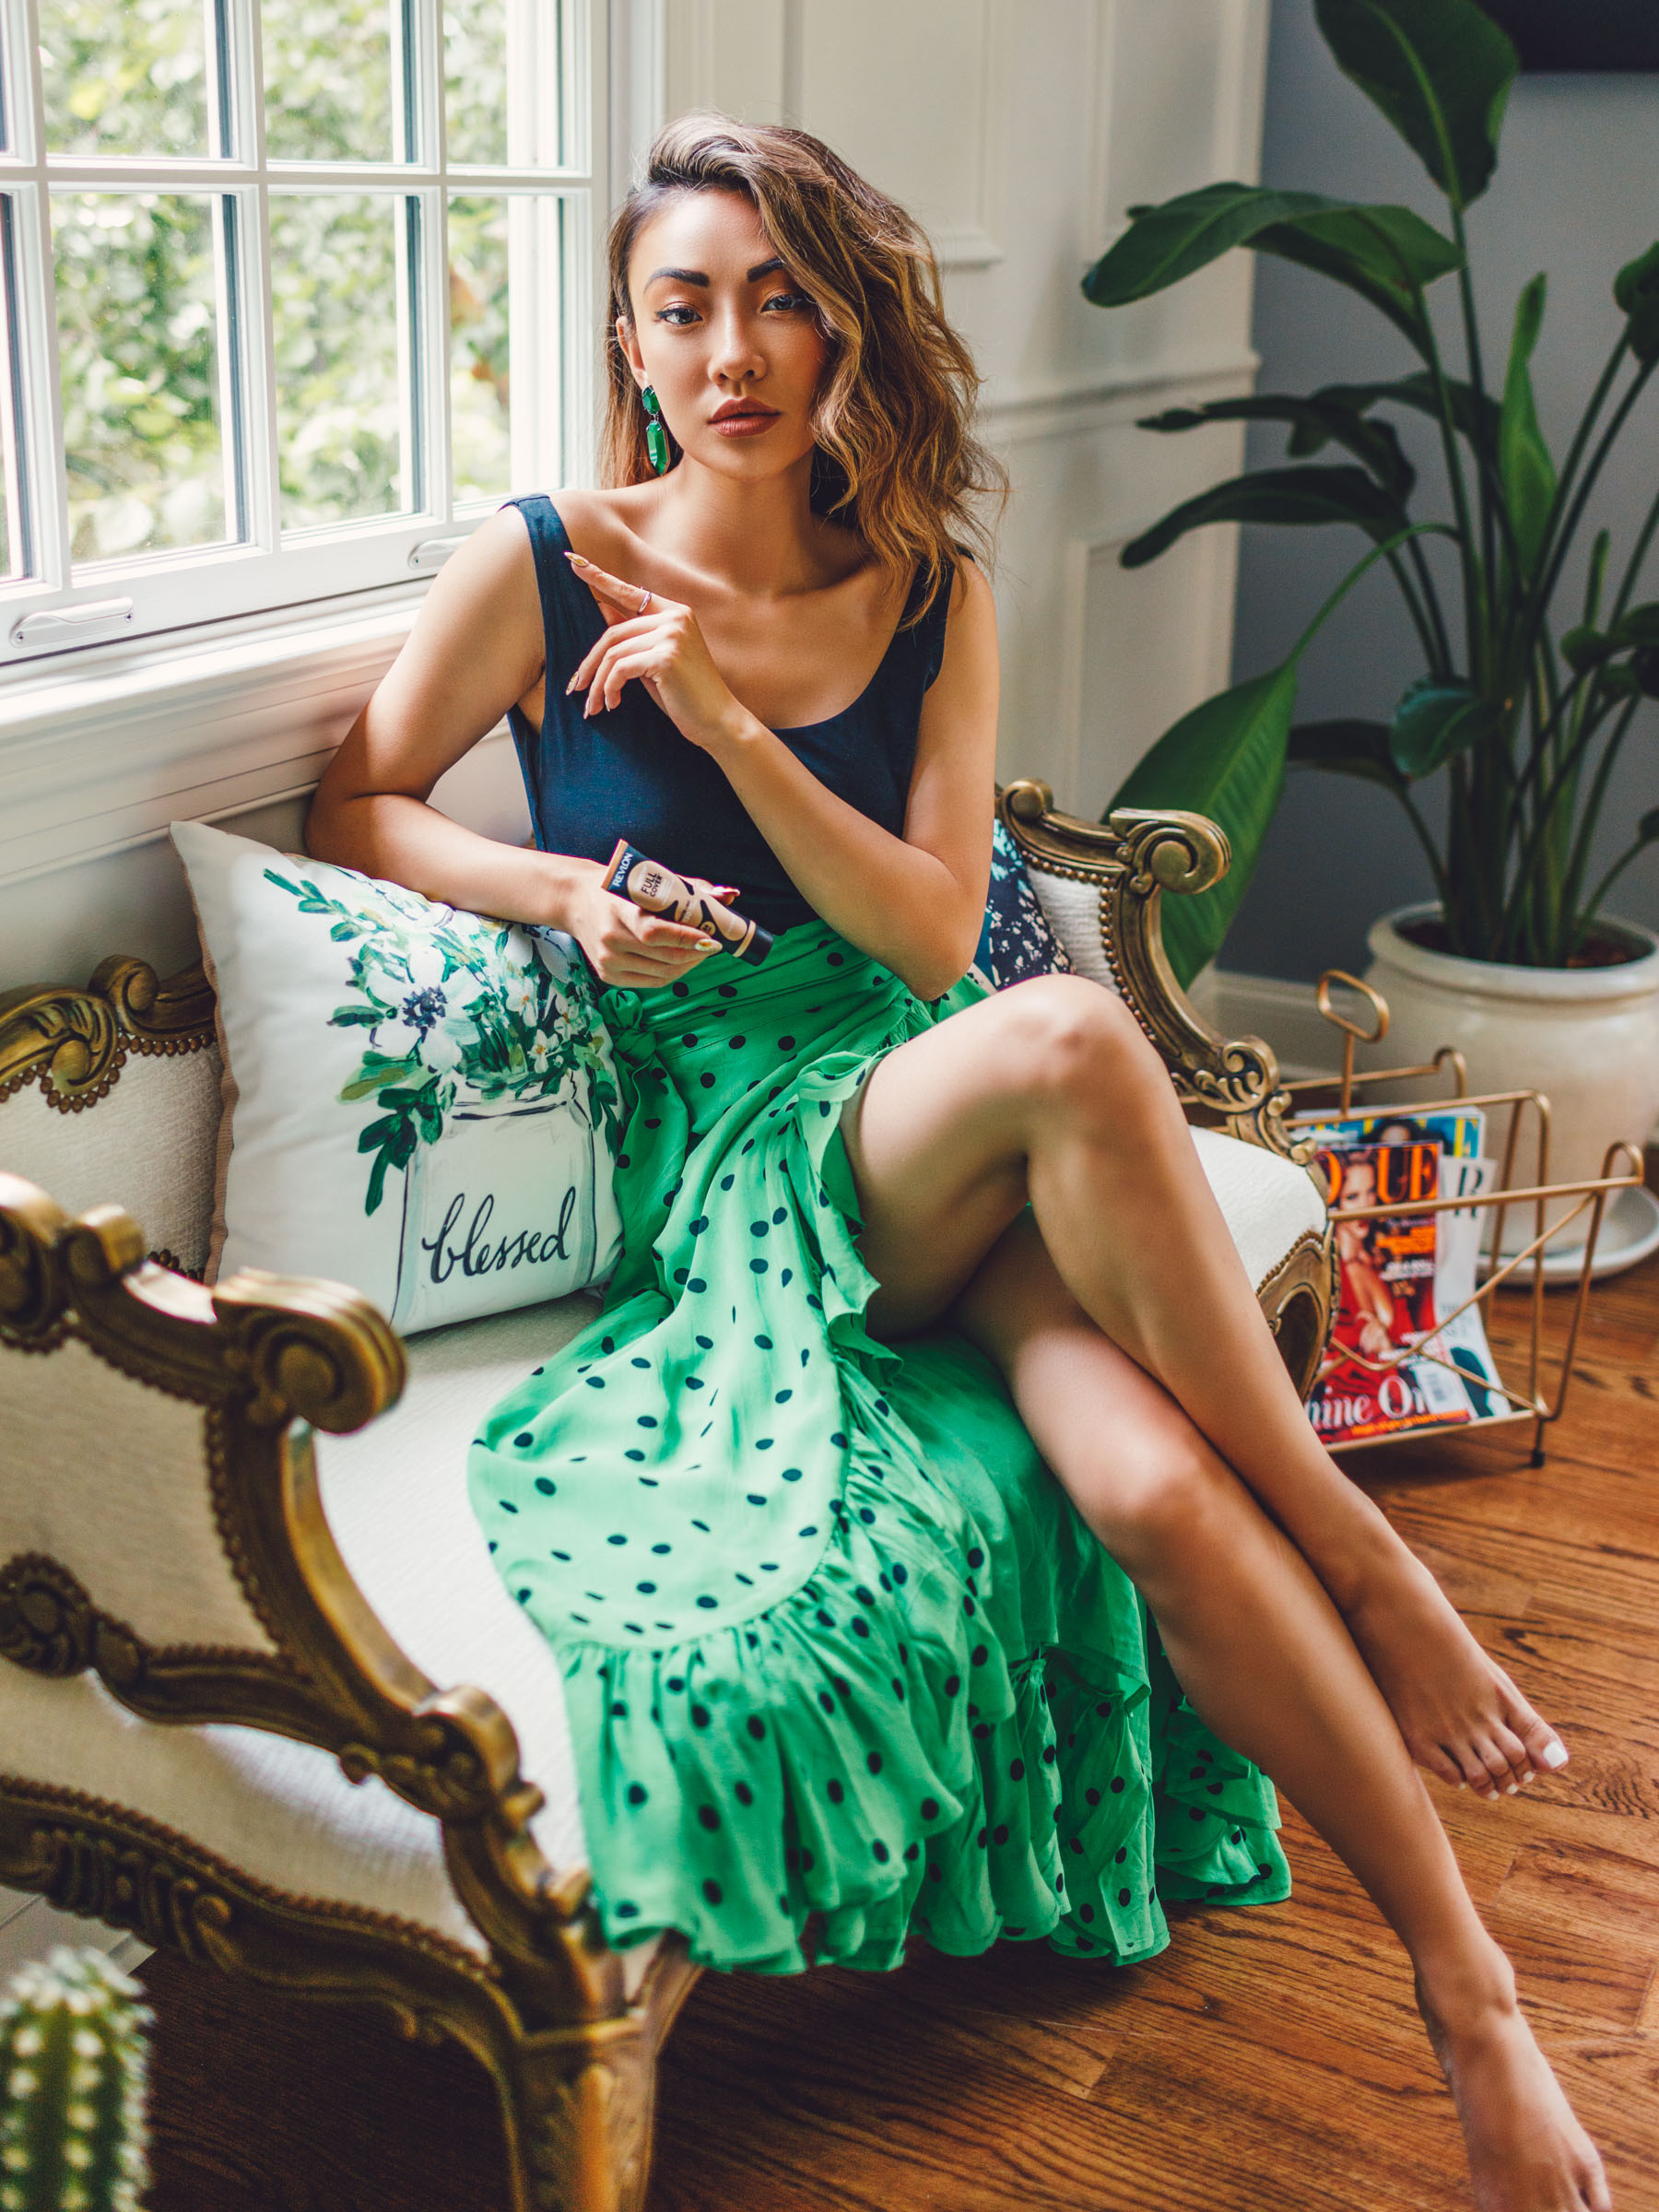 life hack products from amazon, green polka dot skirt, ruffle skirt // Notjessfashion.com